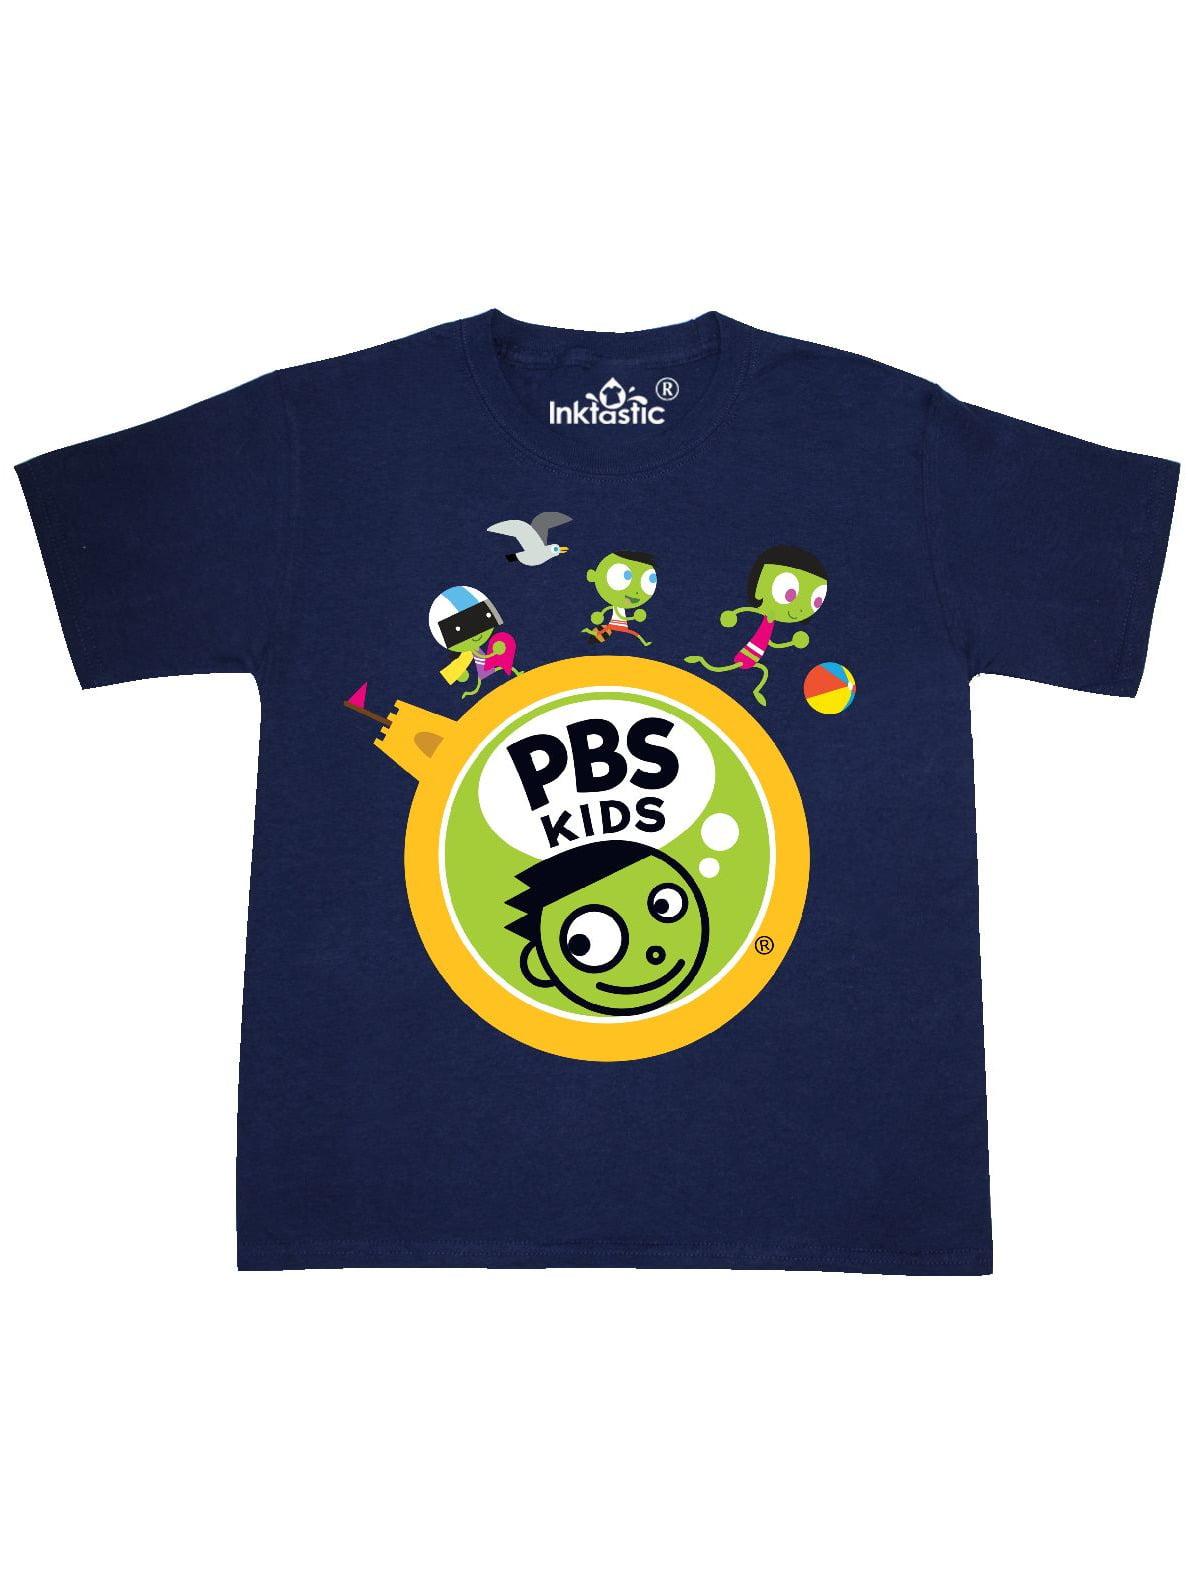 Dot, Del, and Dee Running Around PBS KIDS Logo Beach Youth T-Shirt